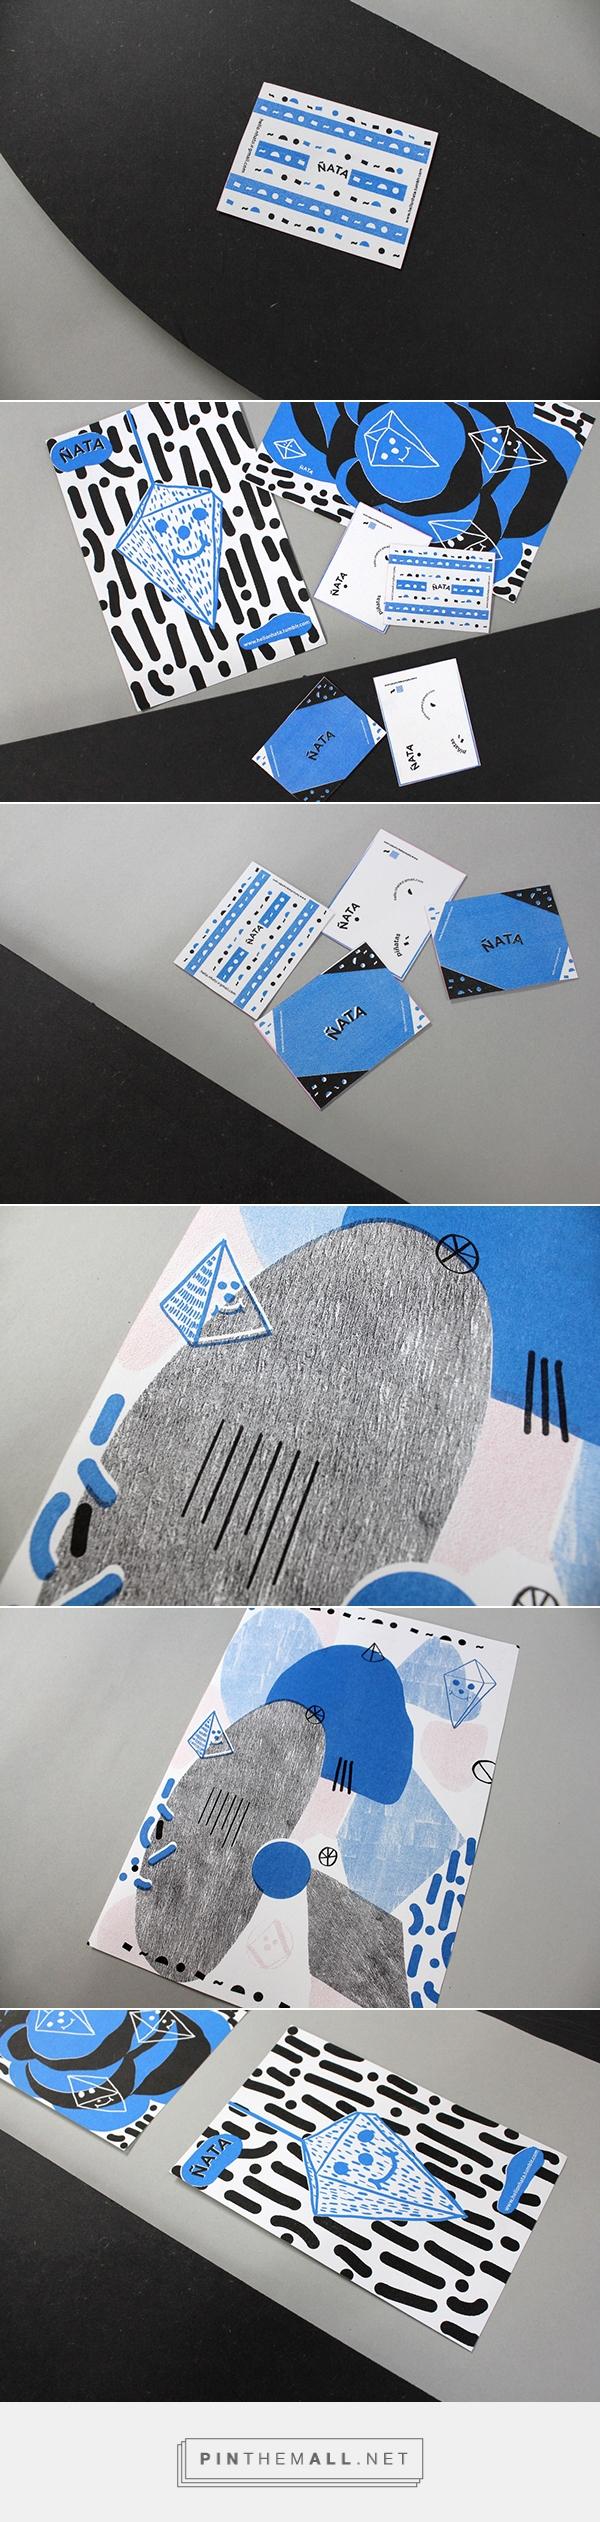 Ñata Visual Identity on Behance   Fivestar Branding – Design and Branding Agency & Inspiration Gallery